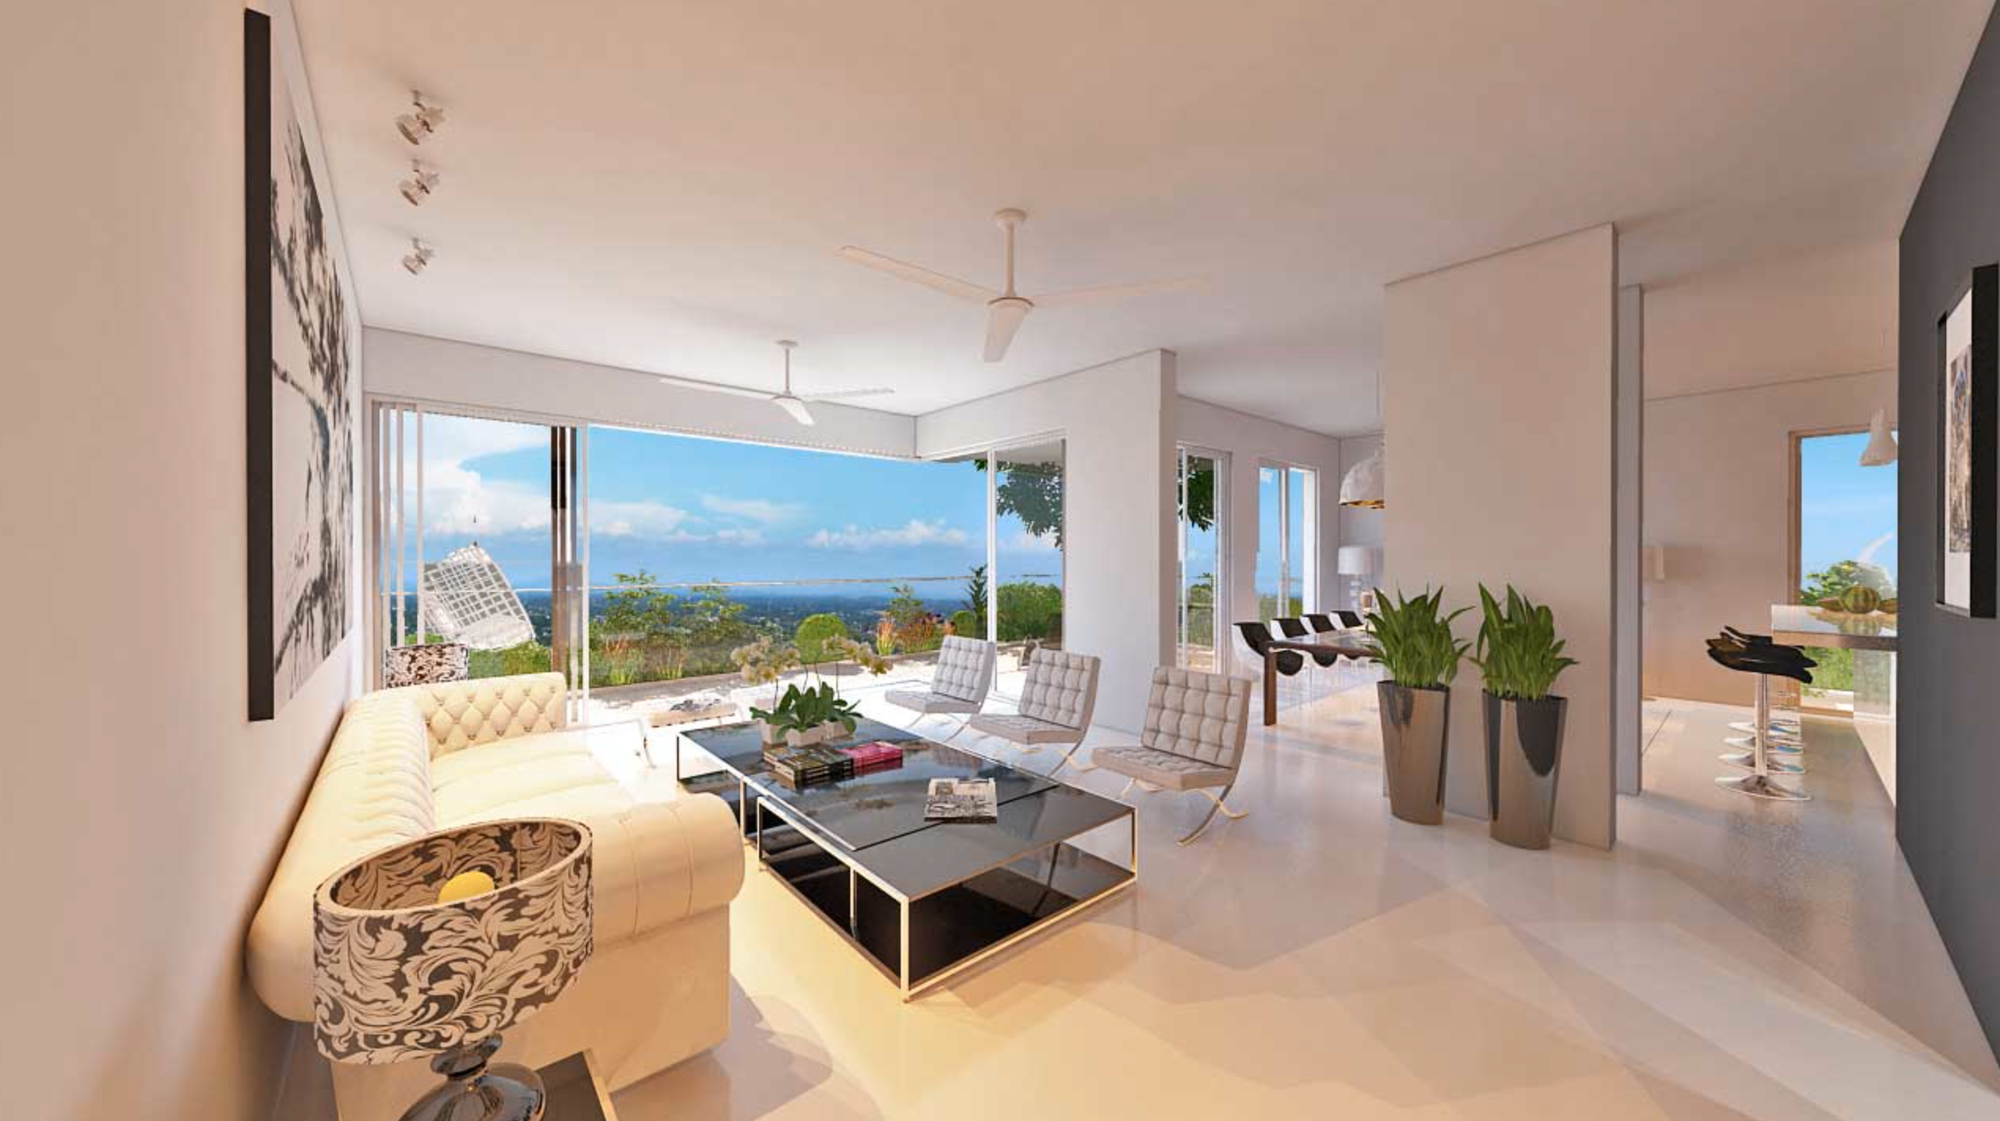 Milroy Perera Designs World's Tallest Residential Vertical Garden